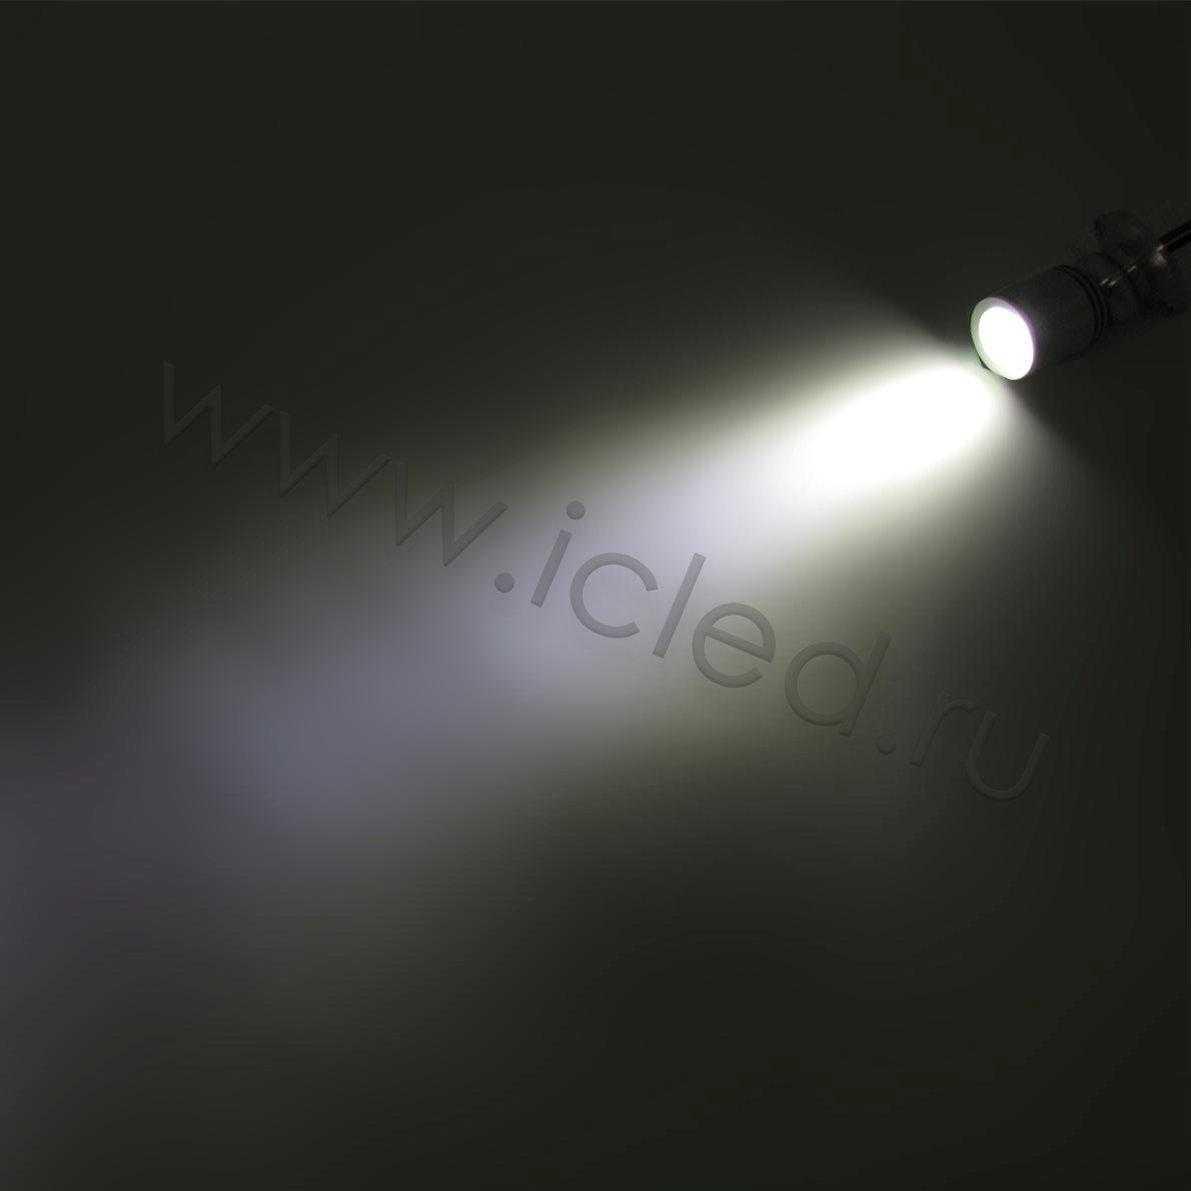 Светильник для подсветки витрин 1W 220V 5000K